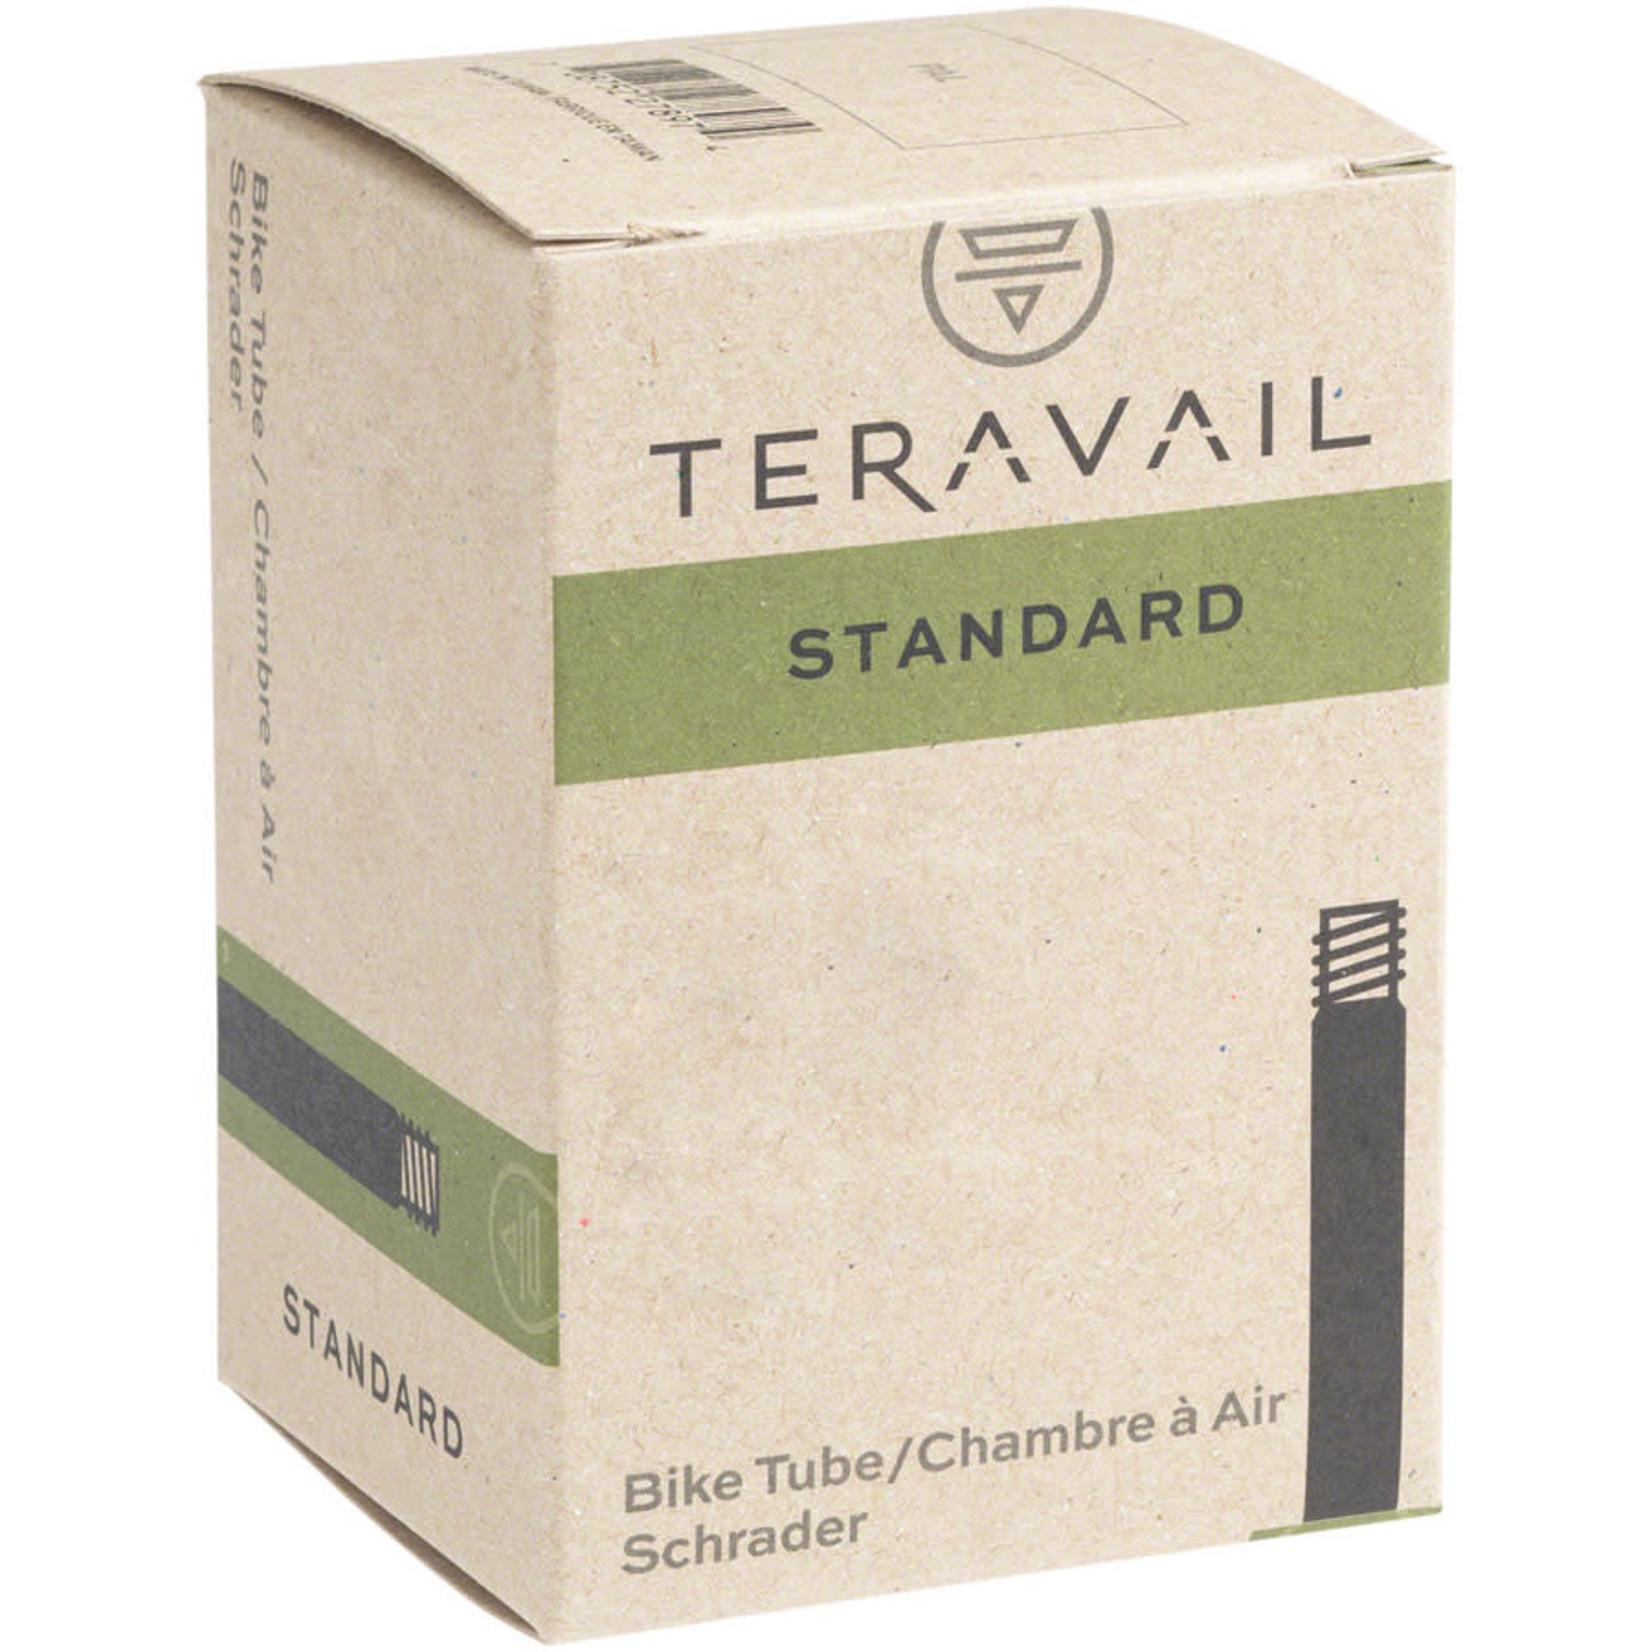 "Q-Tubes Q-Tubes / Teravail 20"" x 1.5-1.75"" Schrader Valve Tube 114g *Low Lead Valve*"